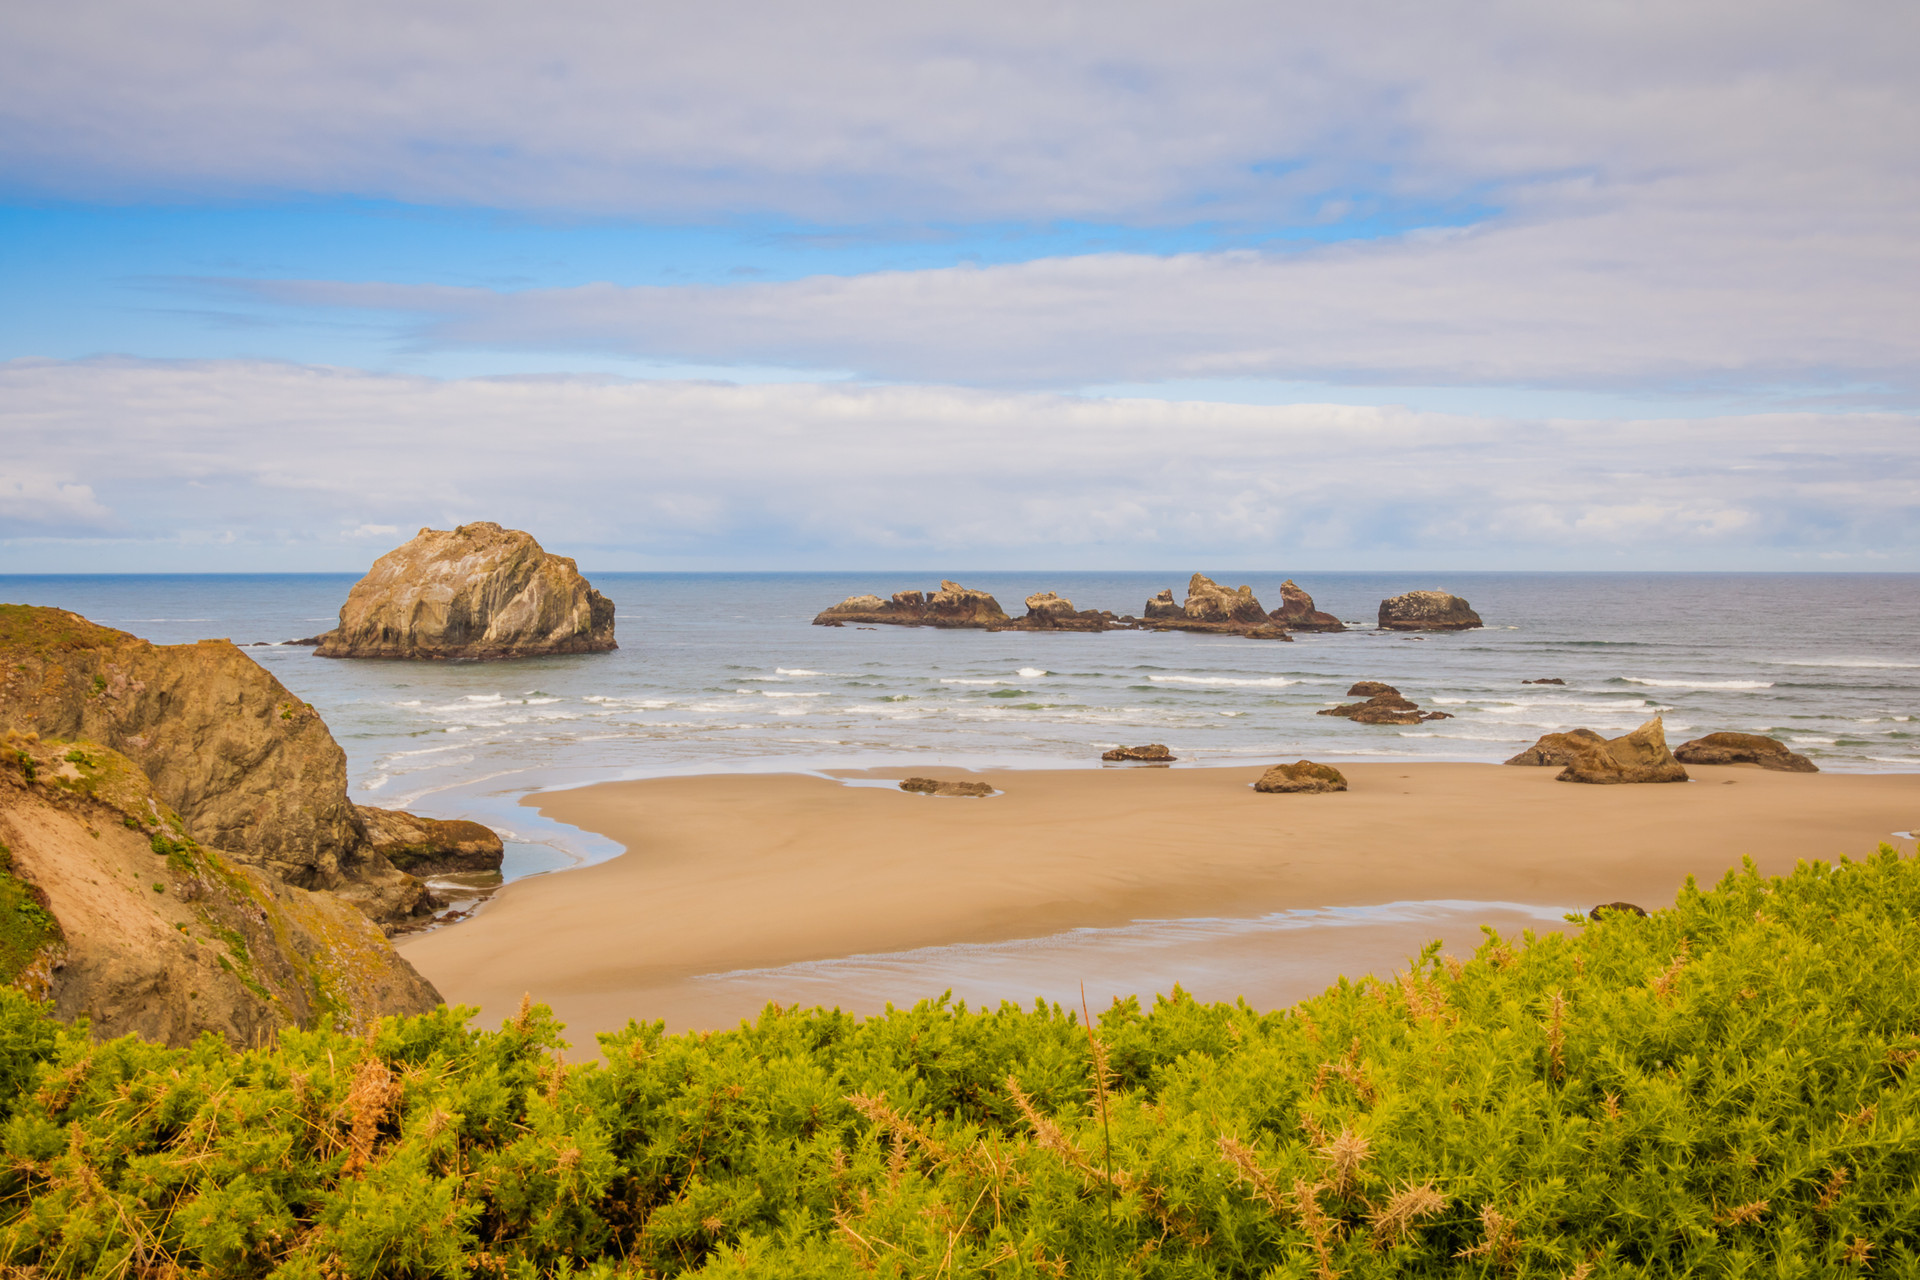 Oregon Coast Rock Formations